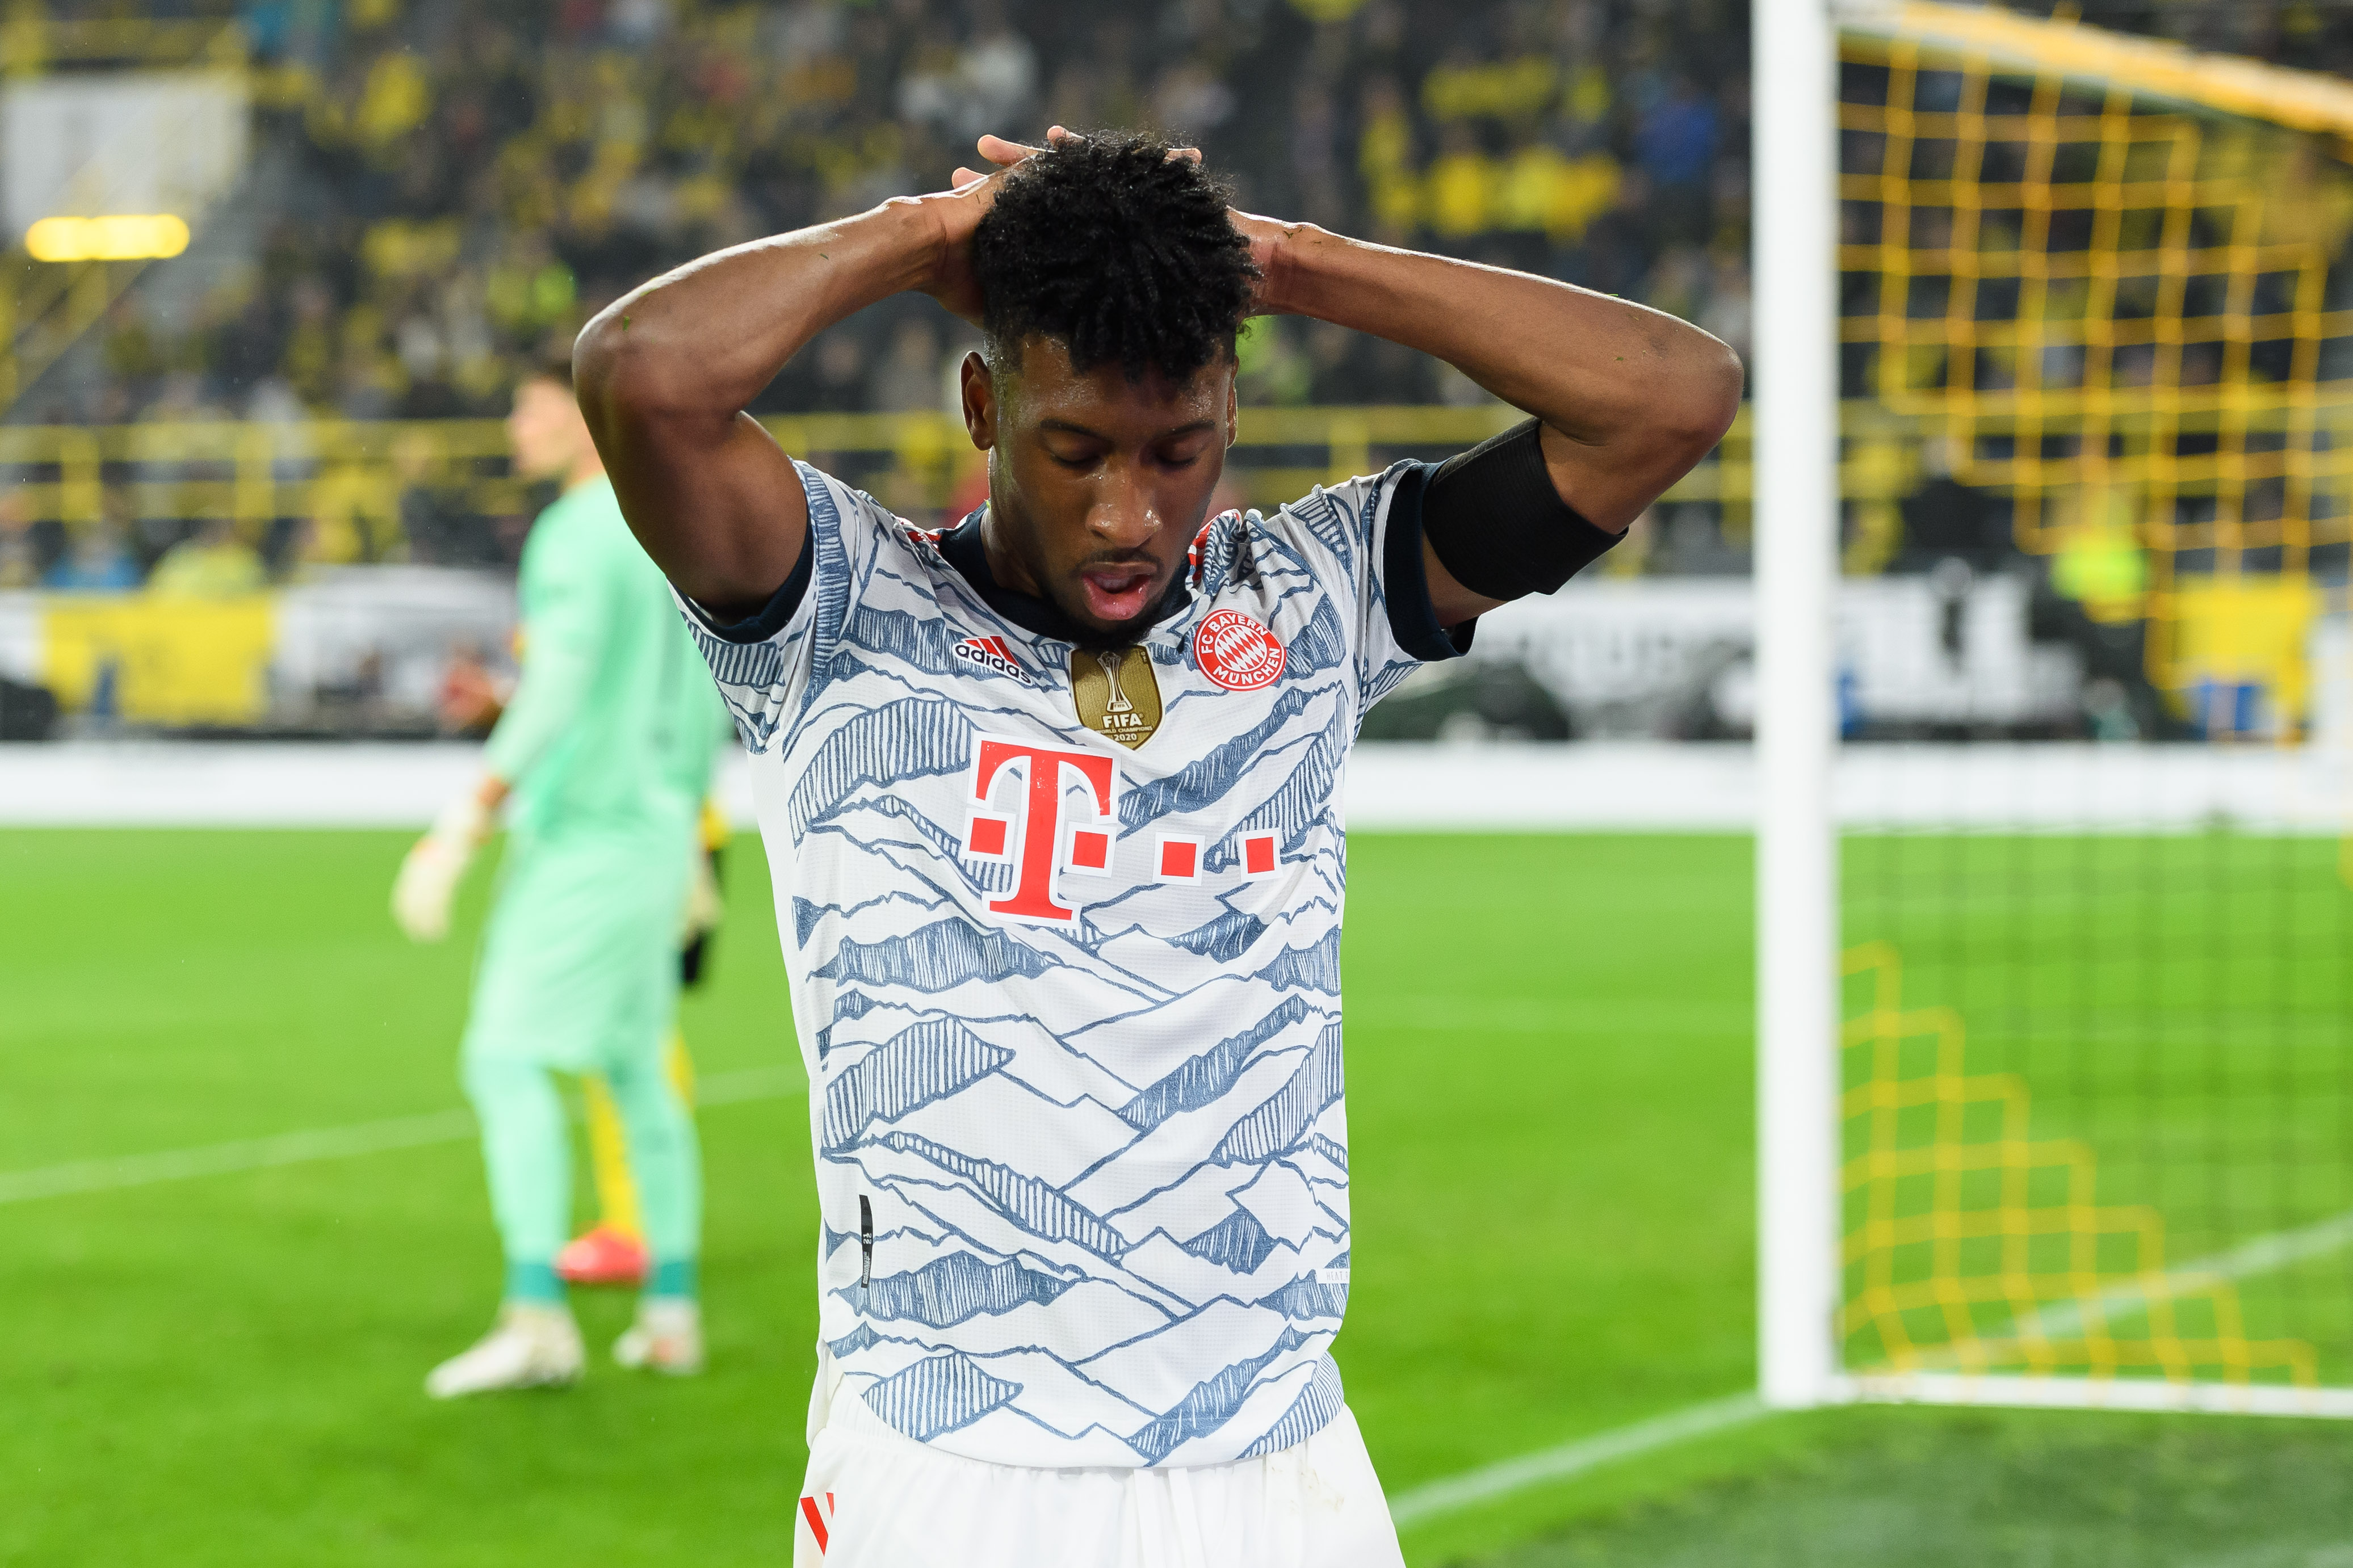 Borussia Dortmund v FC Bayern Muenchen - Supercup 2021